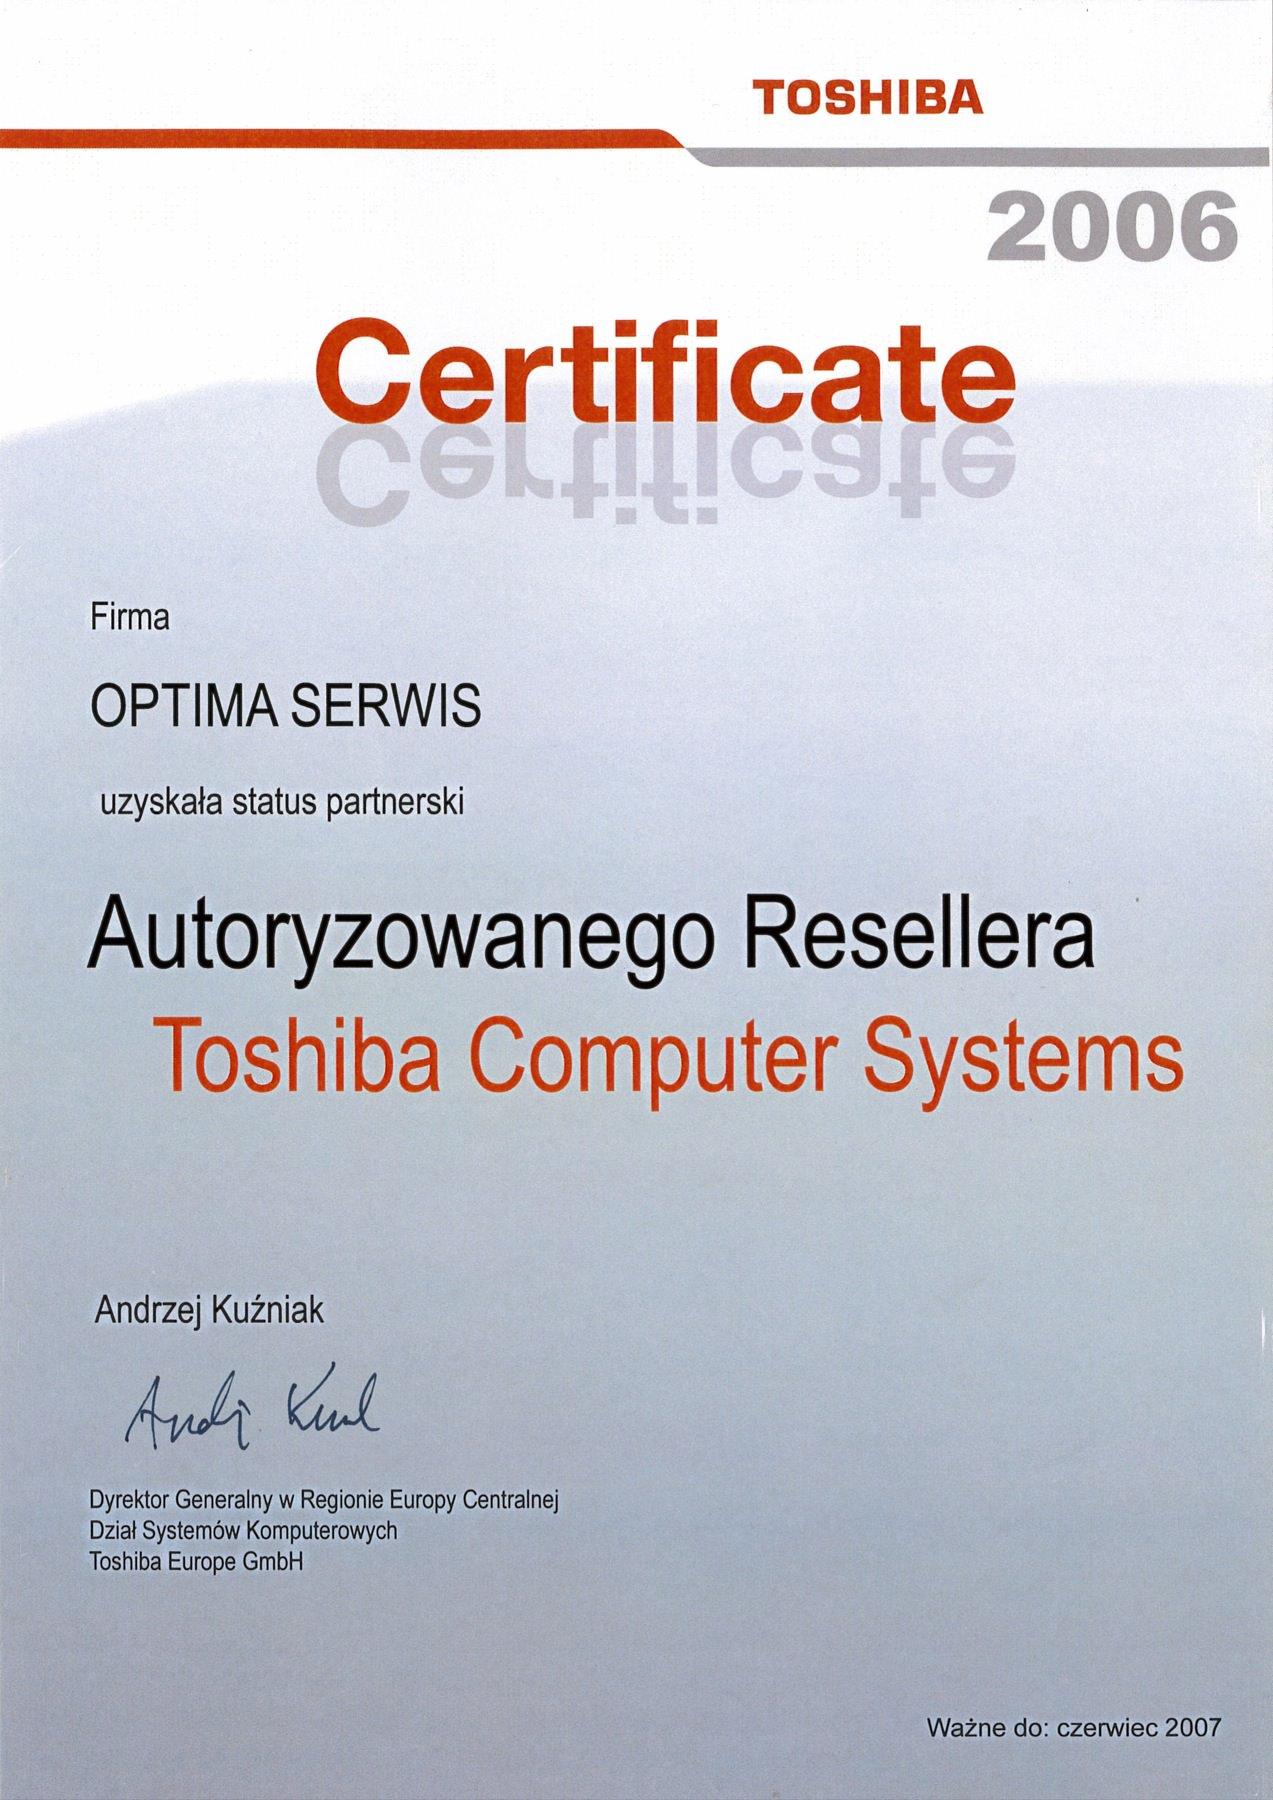 toshiba_2006.jpg